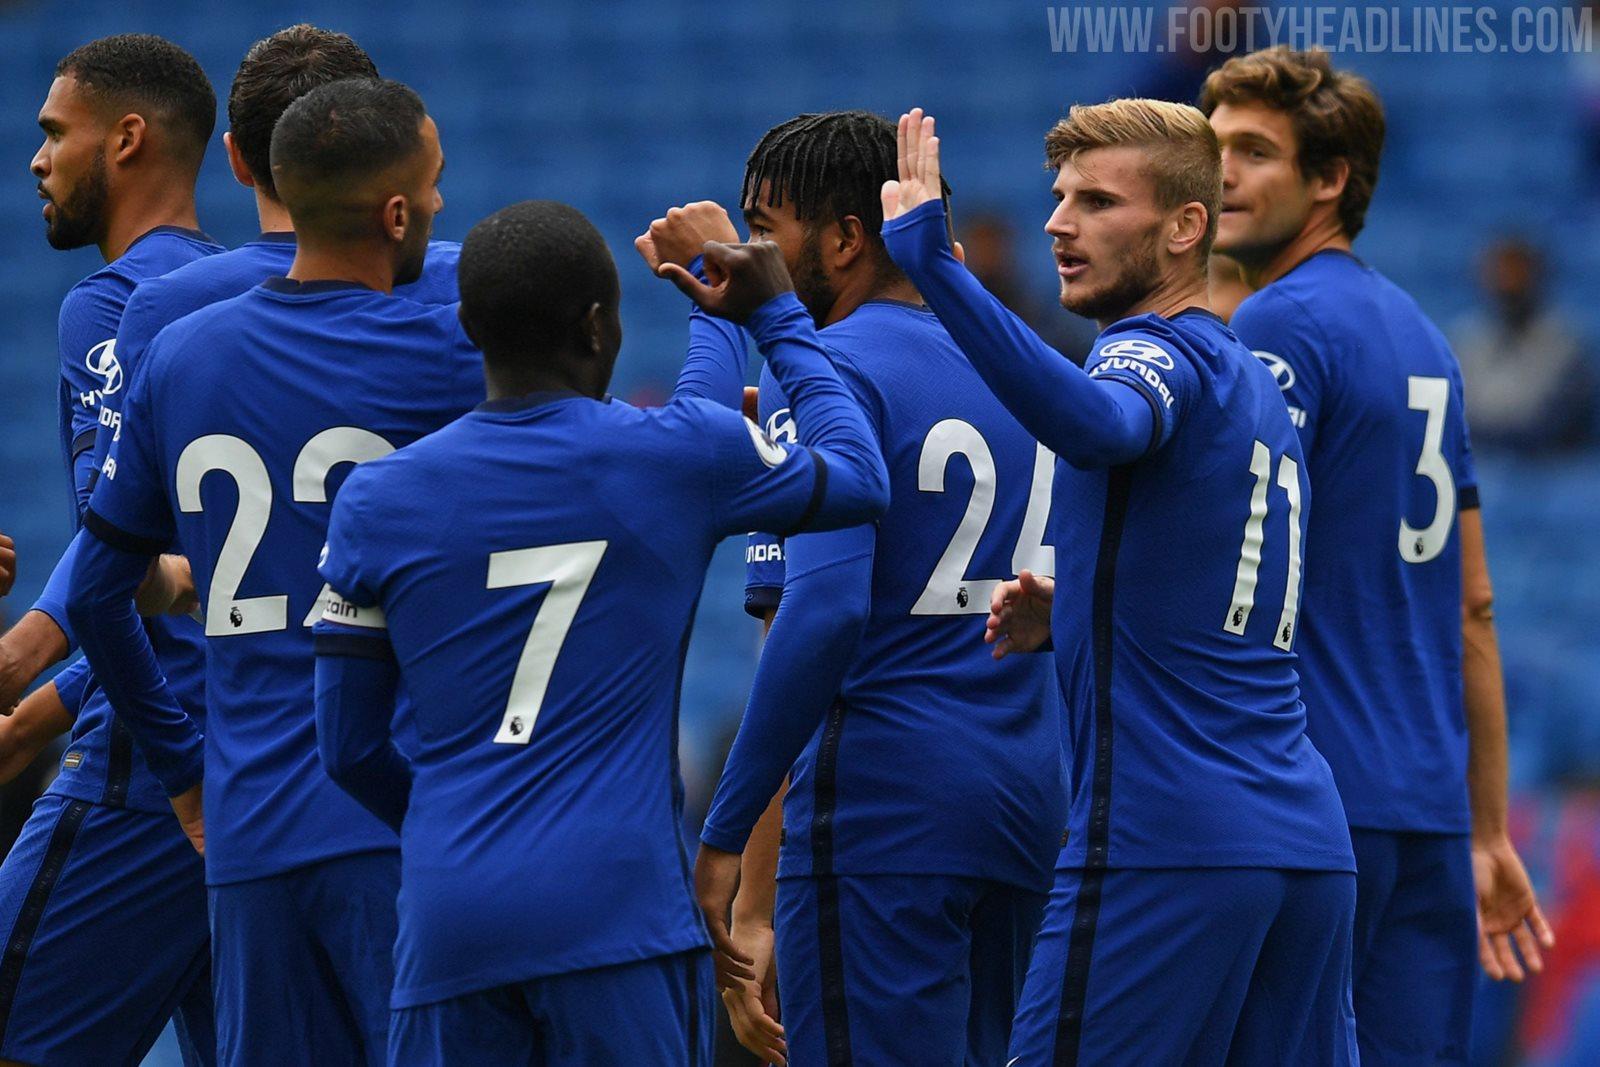 New Chelsea FC Kit Numbers Announced - Havertz, Thiago Silva, Werner ...